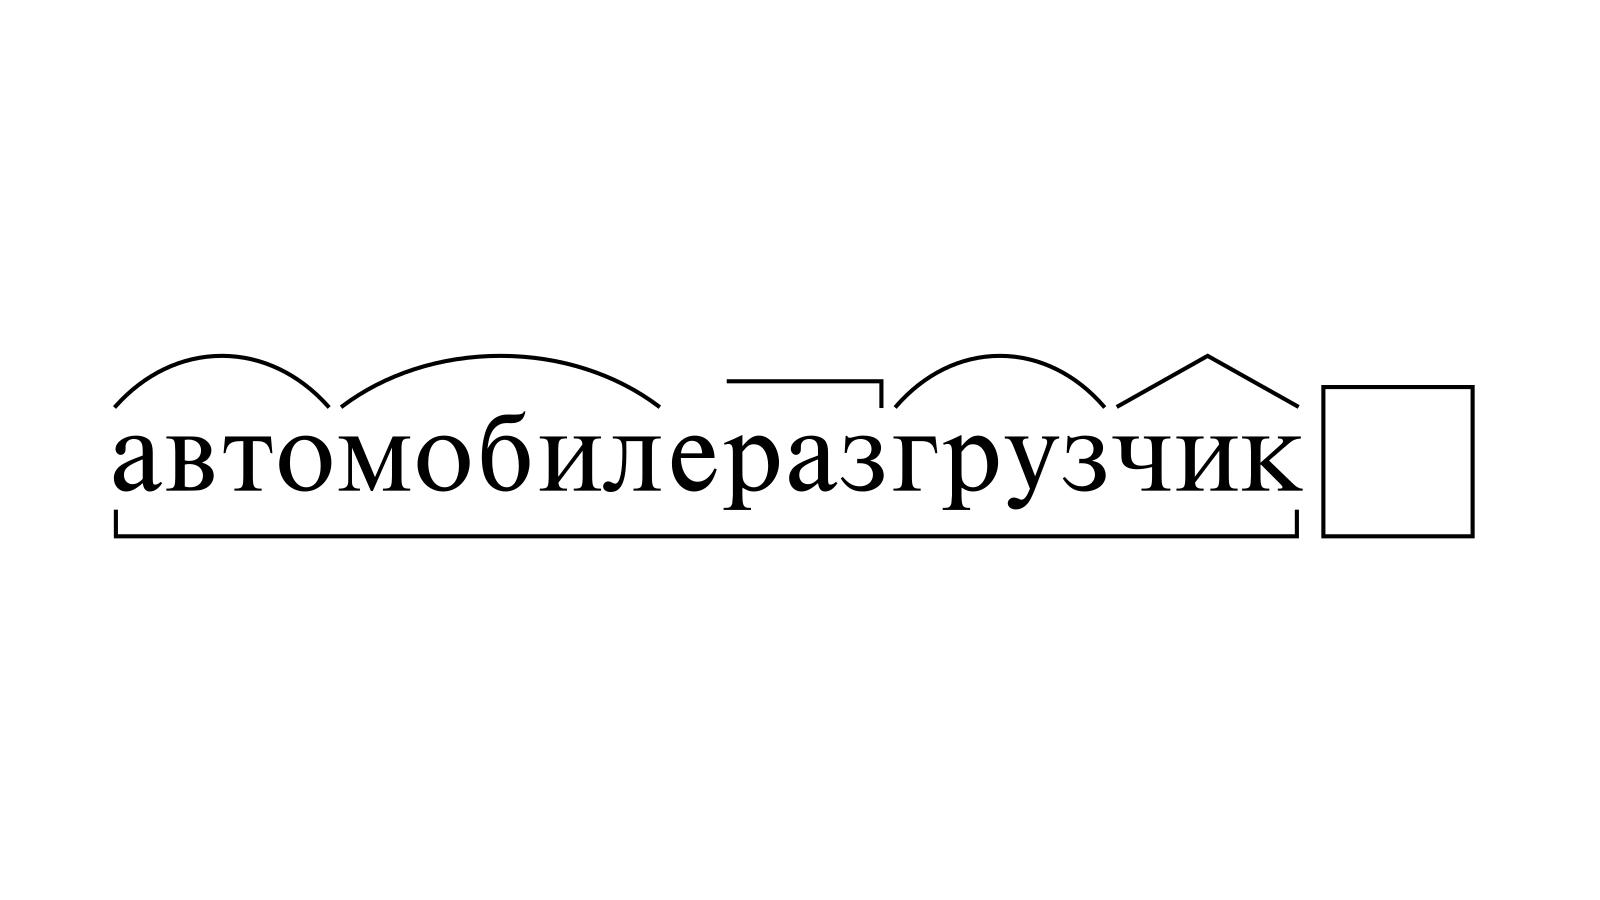 Разбор слова «автомобилеразгрузчик» по составу